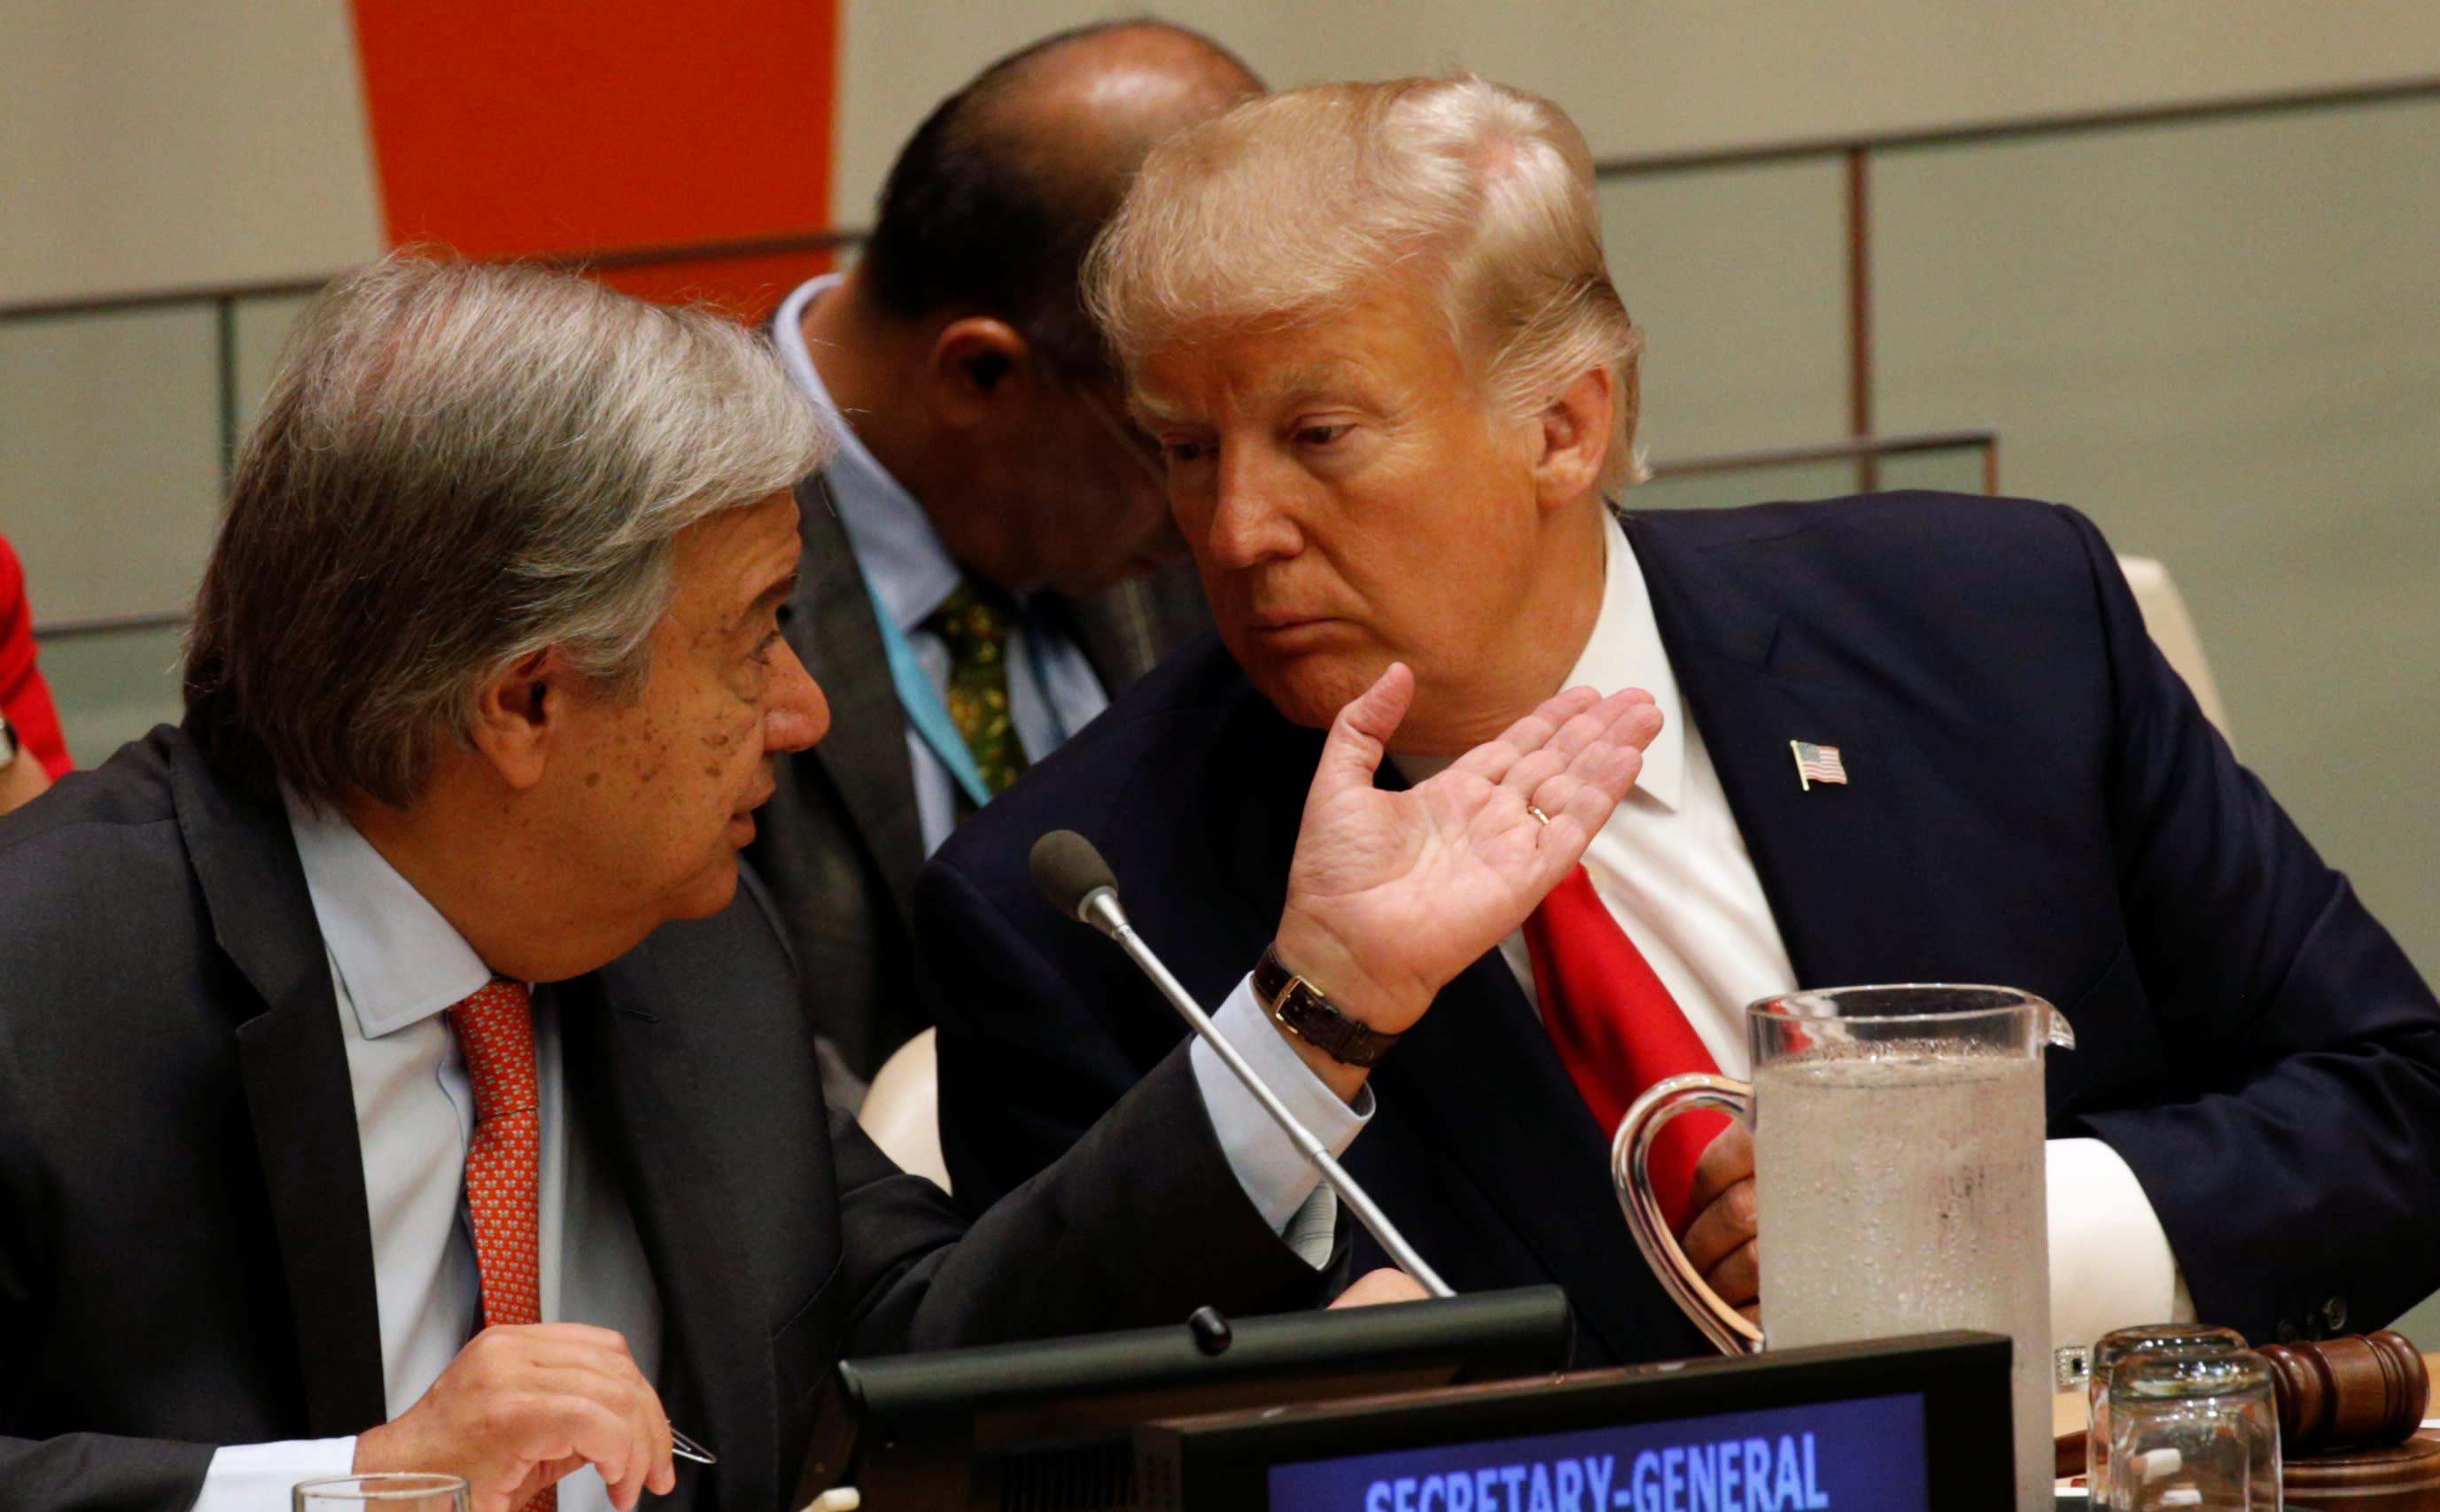 Venezuela Calls Donald Trump's Rhetoric 'Racist and Supremacist' After U.N. Speech